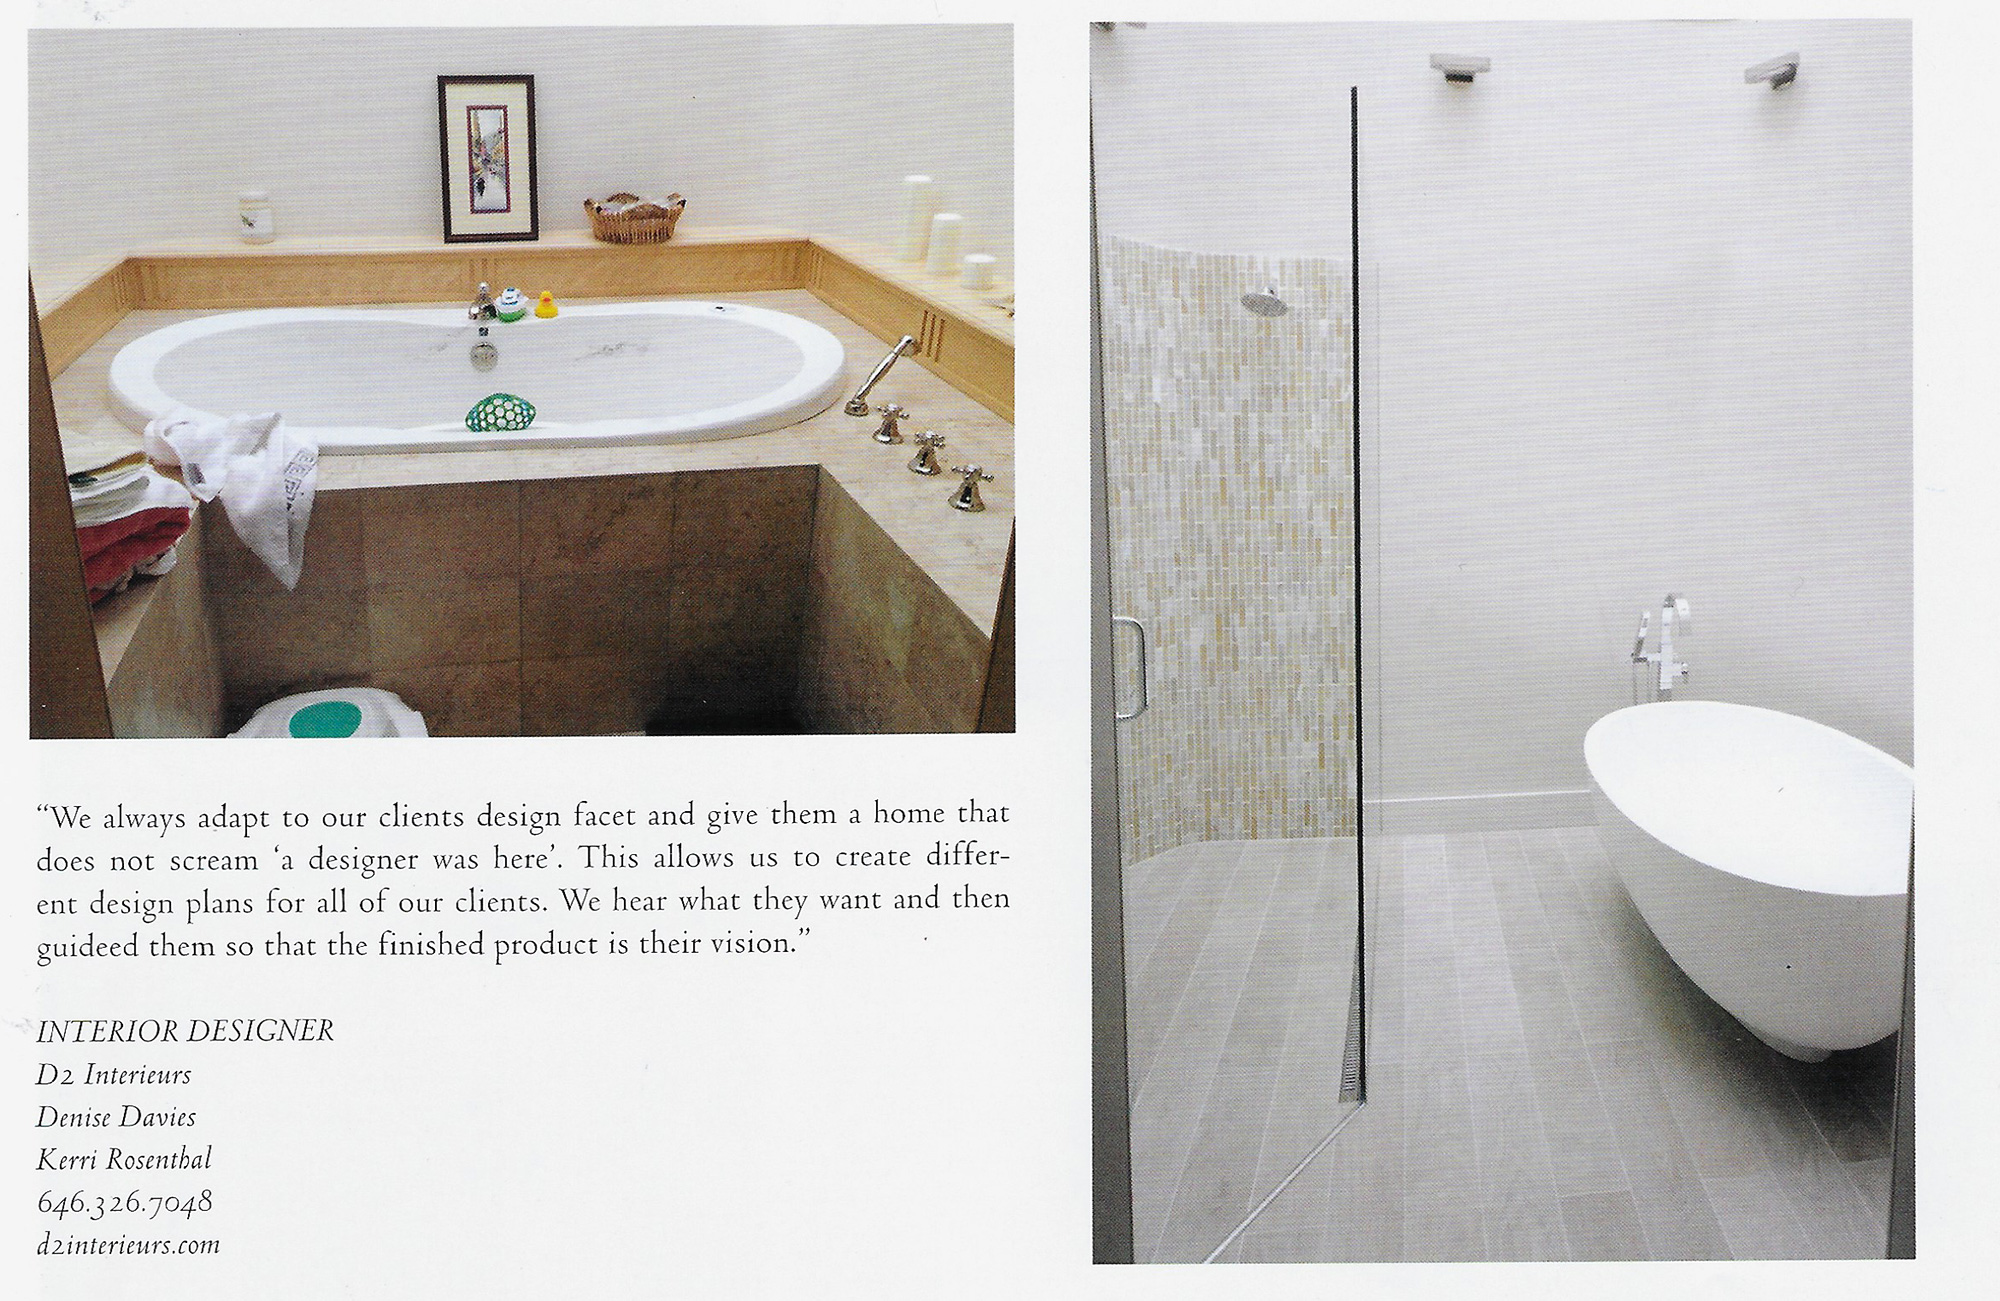 east-coast-home-design-idyllic-design-transformatio4